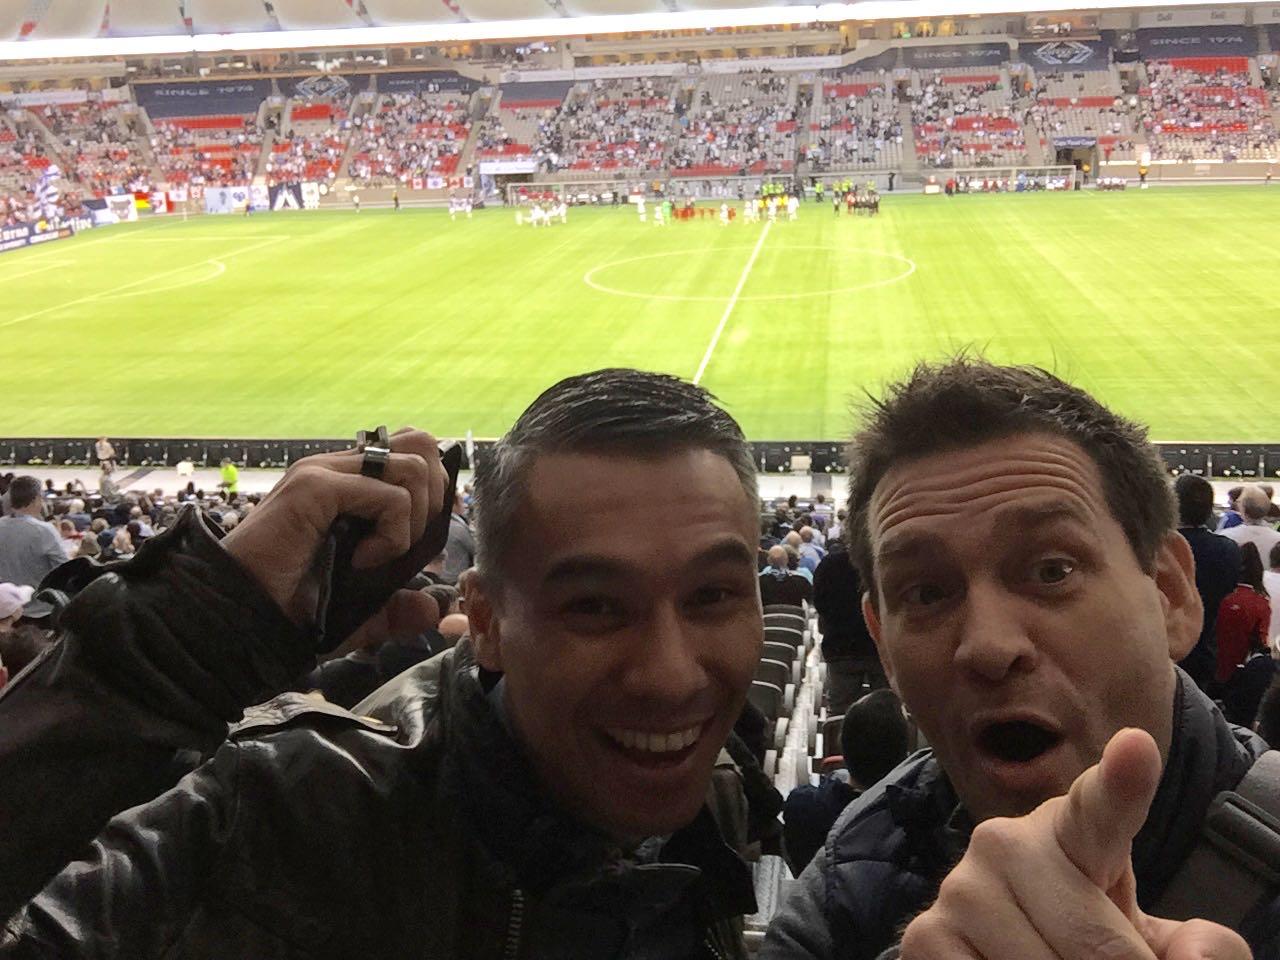 Ben Harmanus (links) und Dave Hertig im Fussballstation: Vancouver White Caps vs. Olimpia aus Paraguay (Concacaf Champions League)